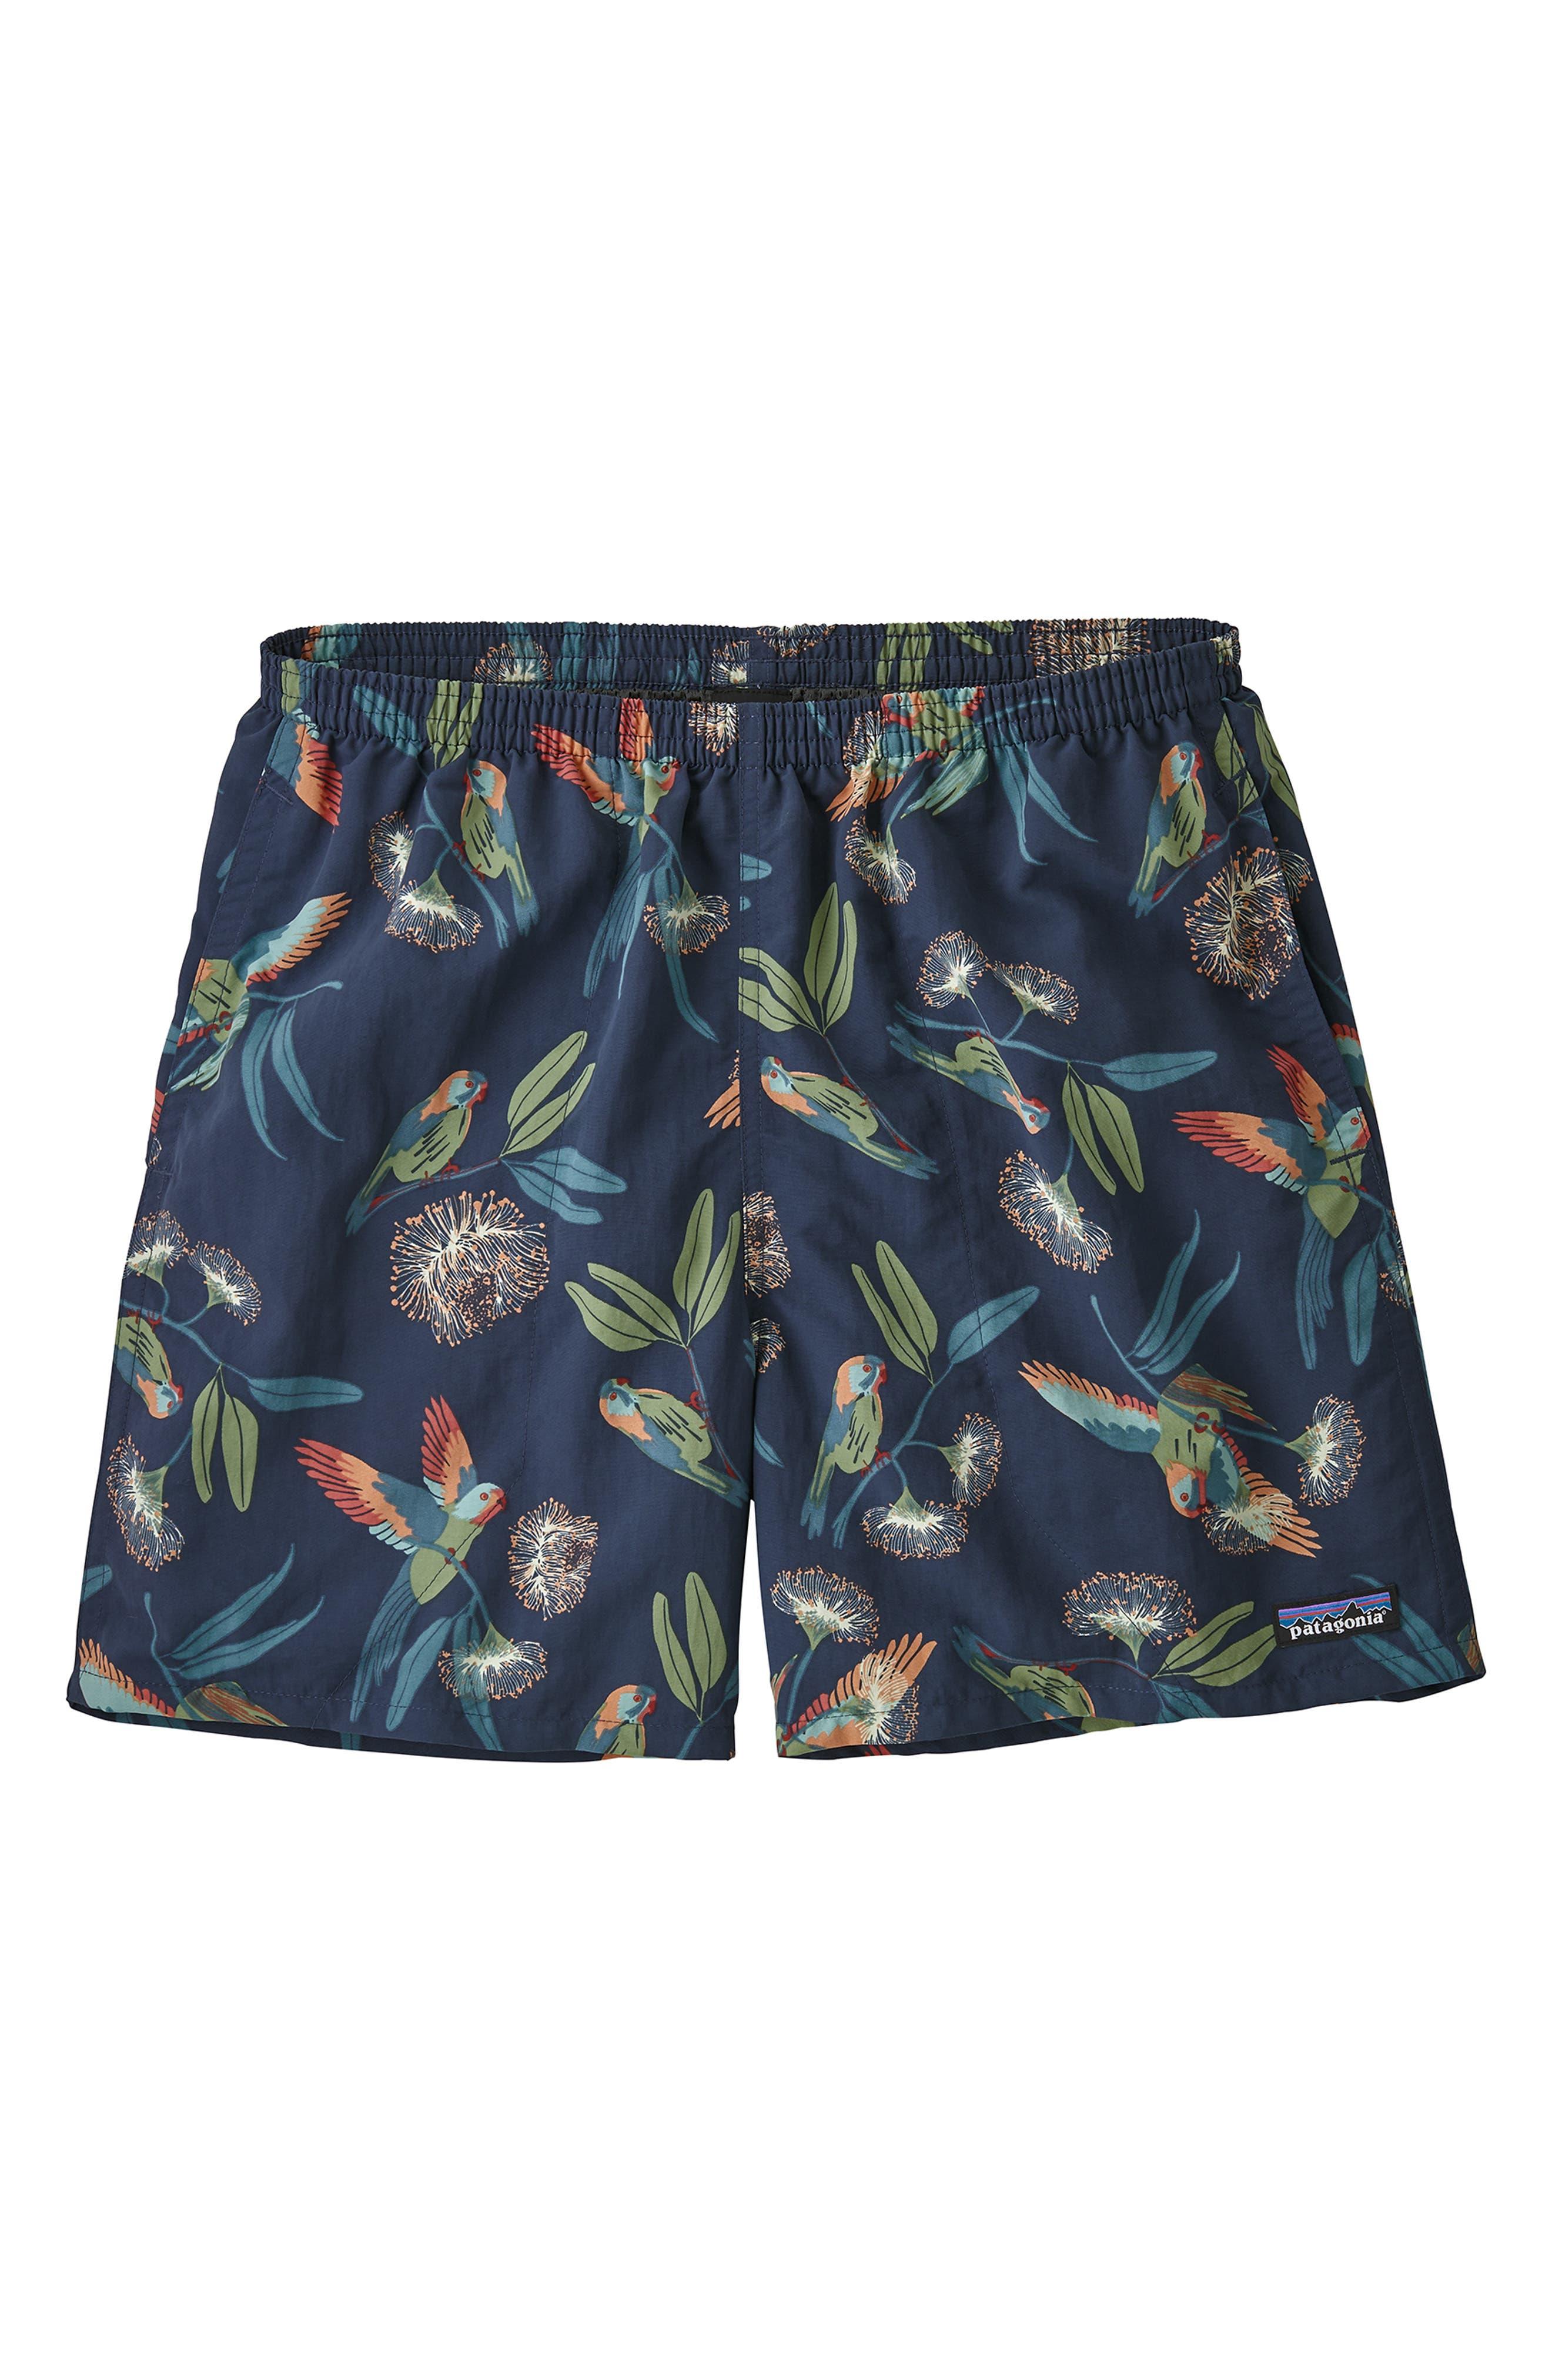 Men's Clothing 2017 New French Board Shorts Men Linen Solid Beach Shorts Mens Flax Casual Mens Short Brand Designer Men Short Summer Bermuda Attractive Appearance